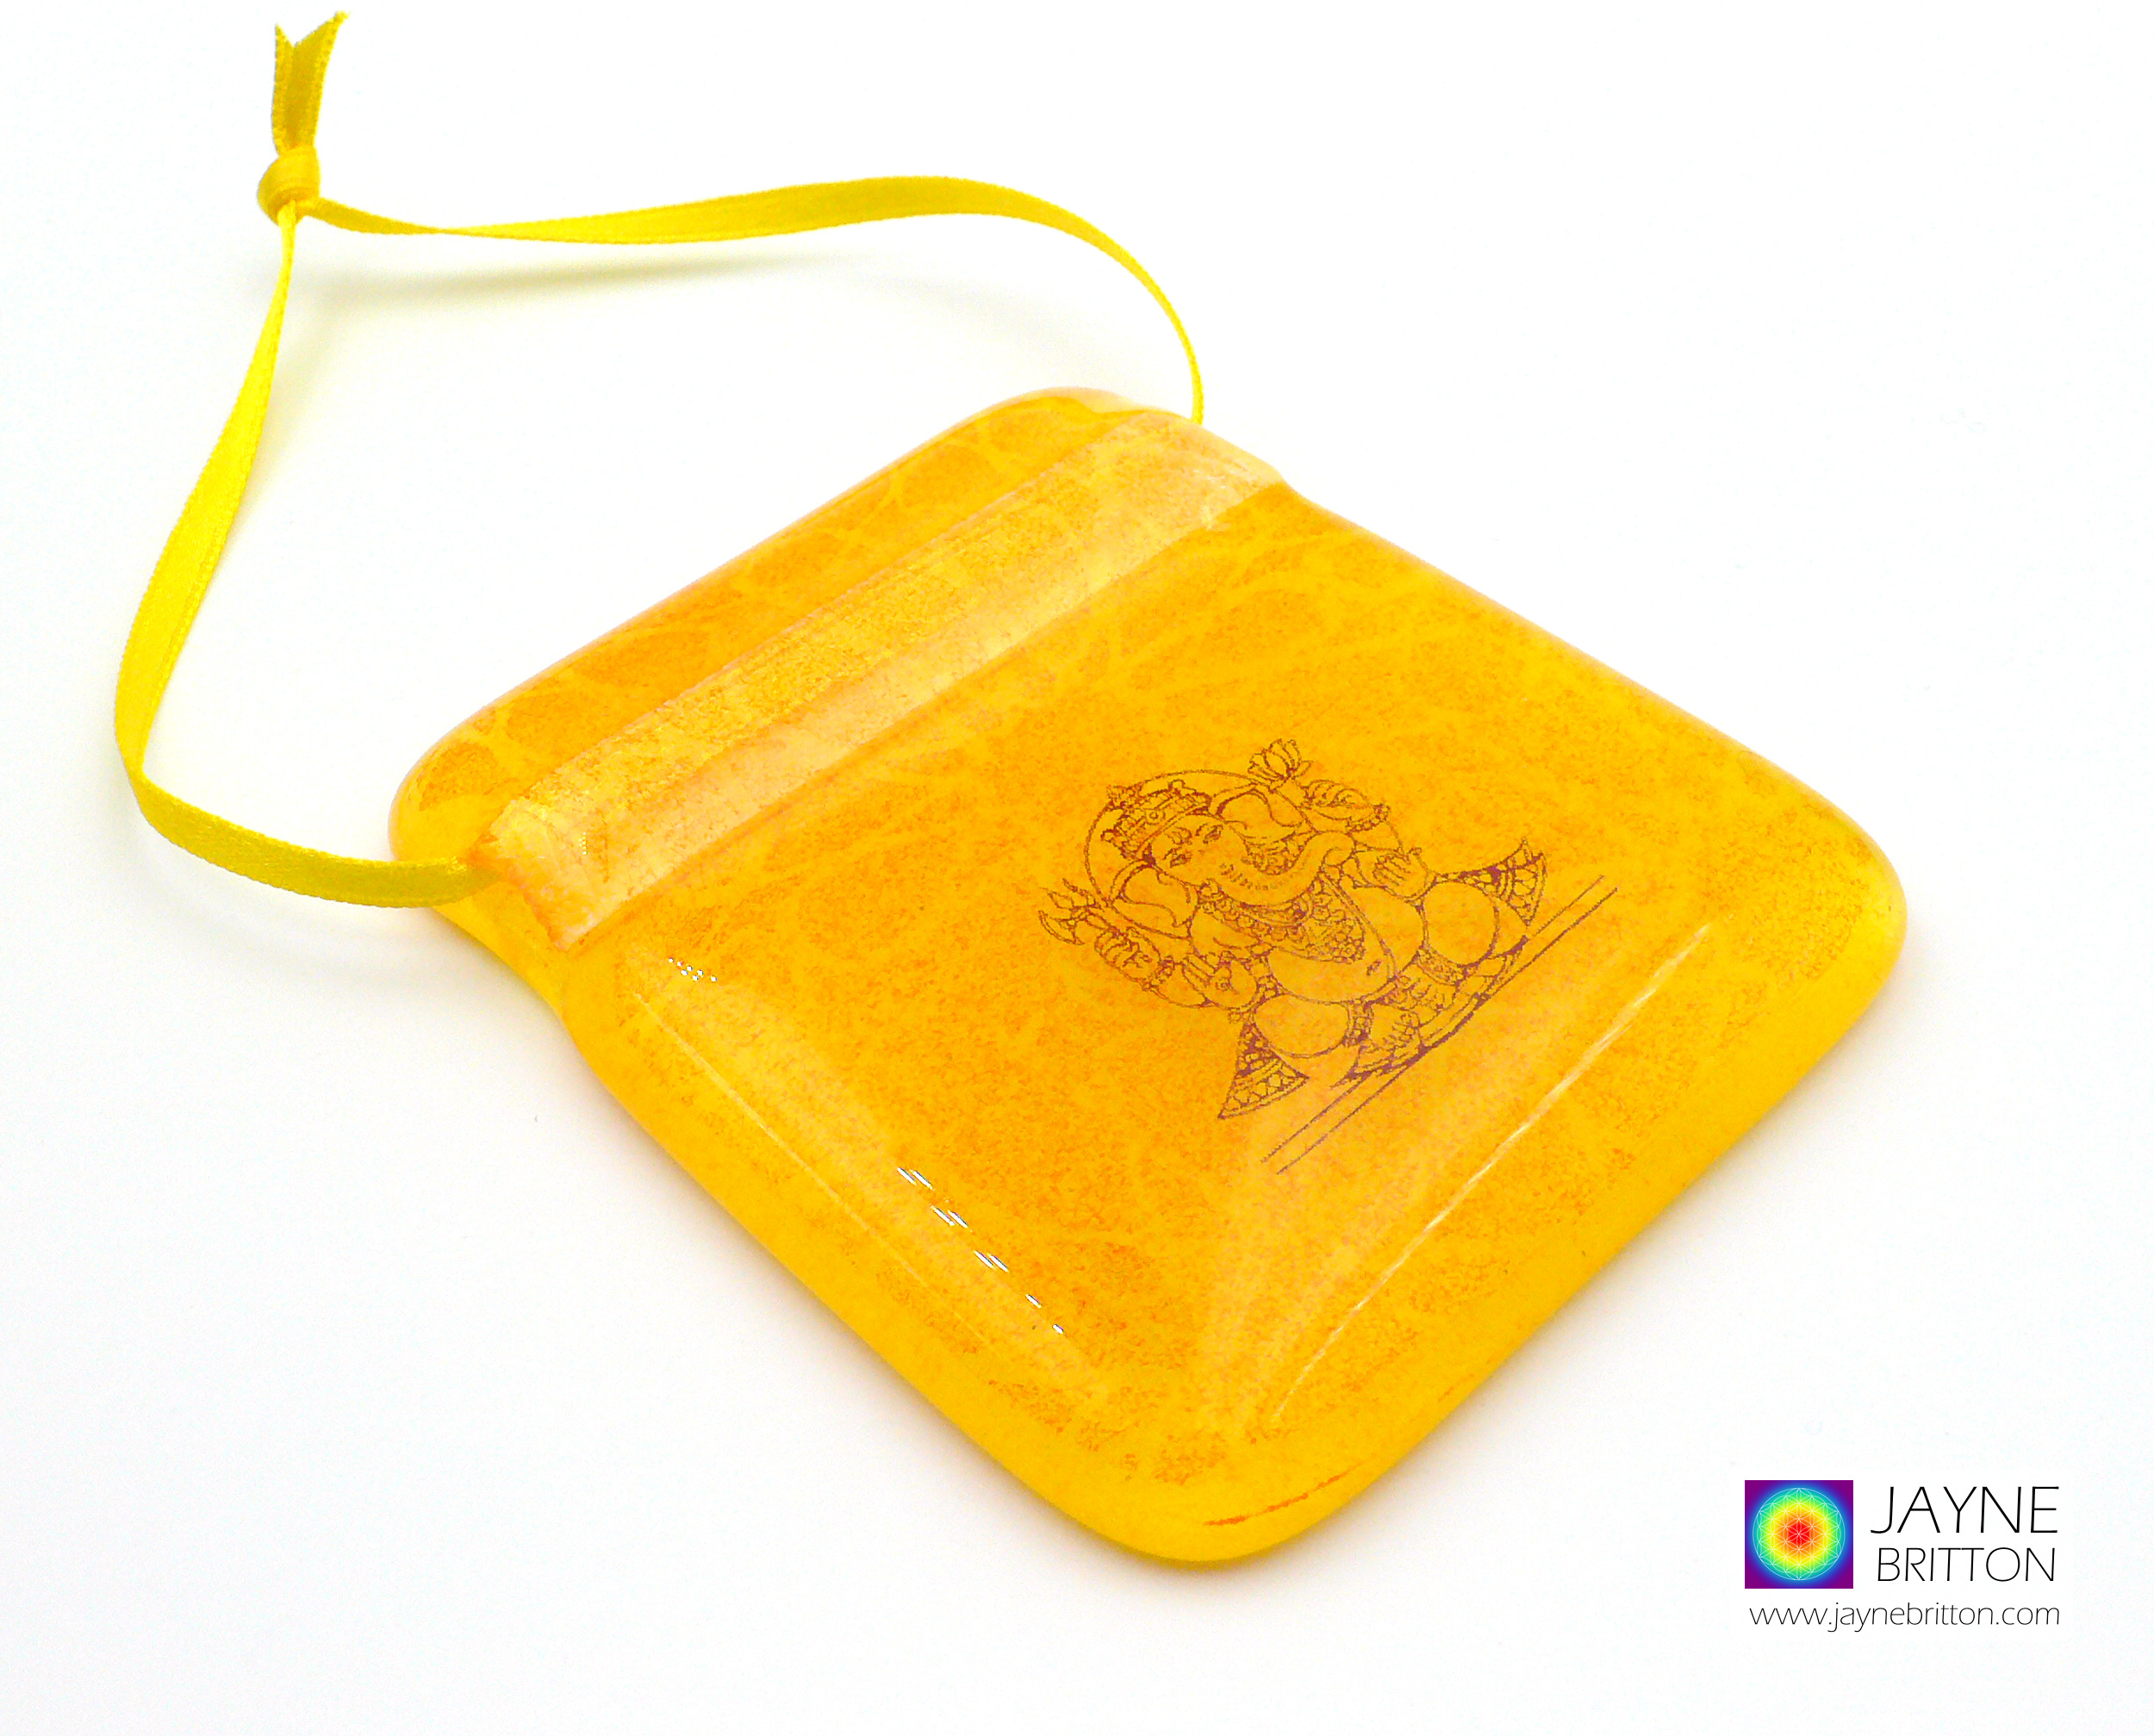 Ganesh sacred geometry light catcher, handmade fused glass